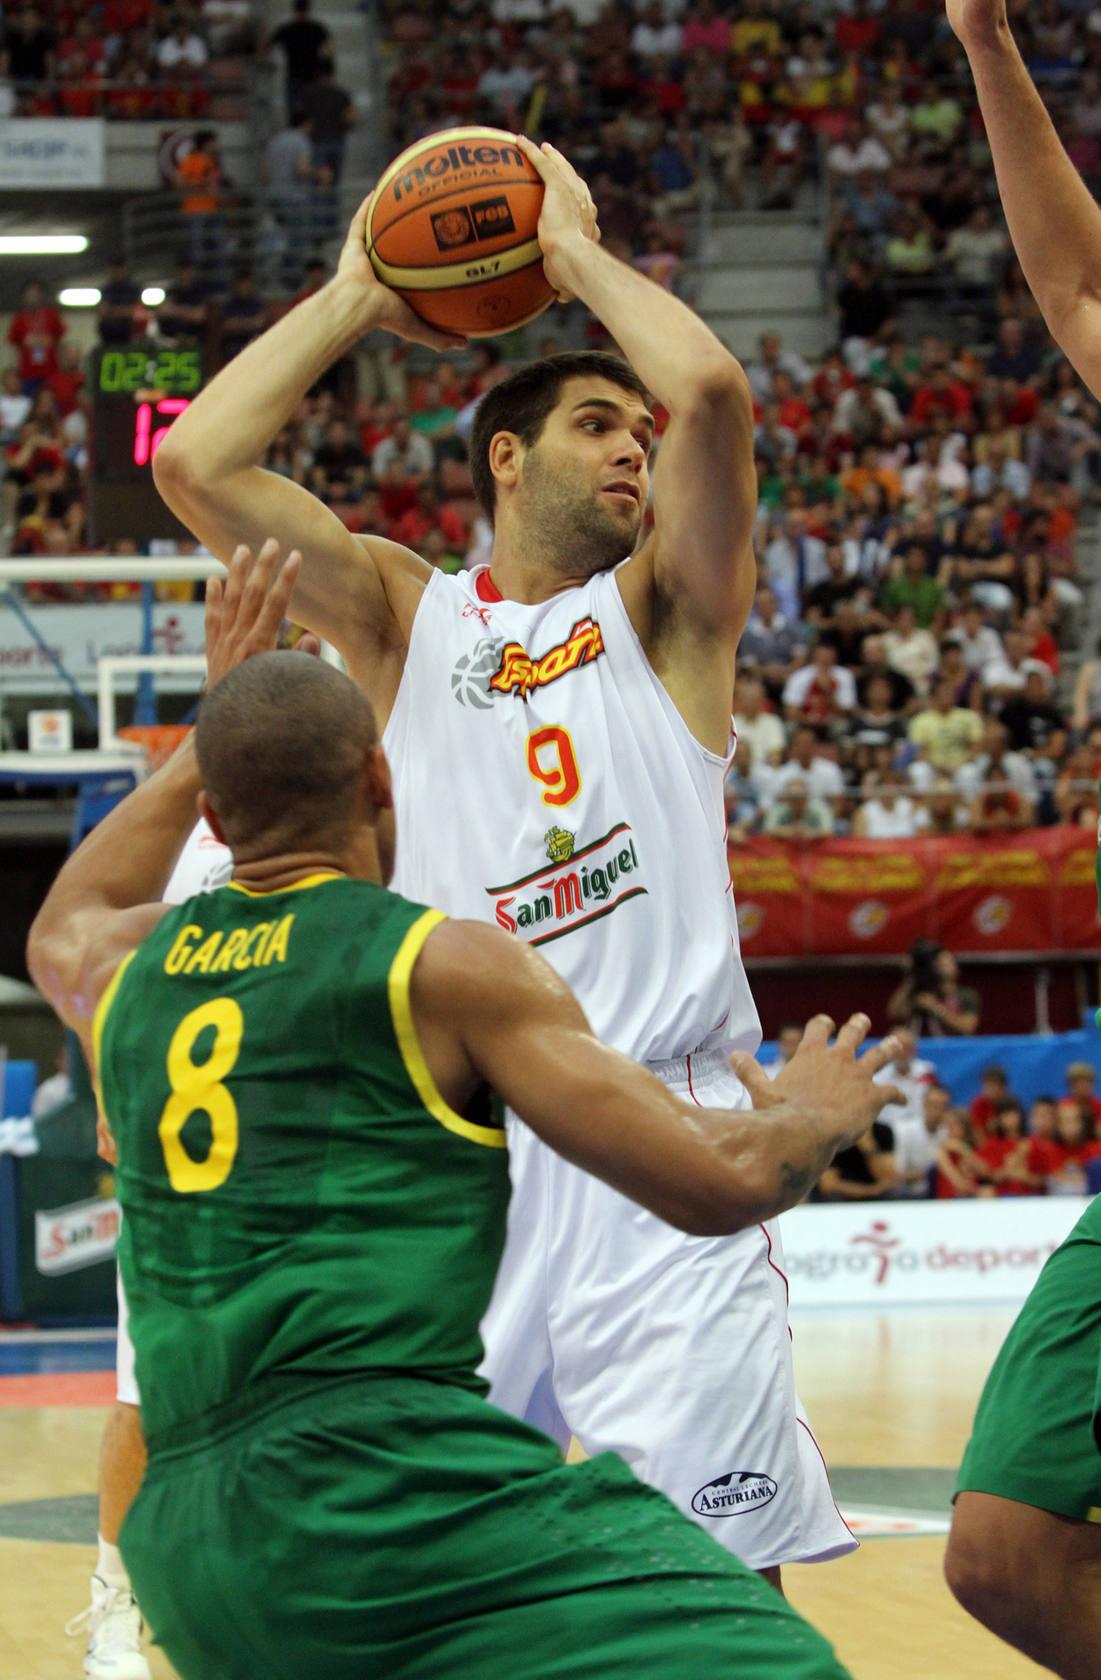 Torneo Internacional Baloncesto 2010